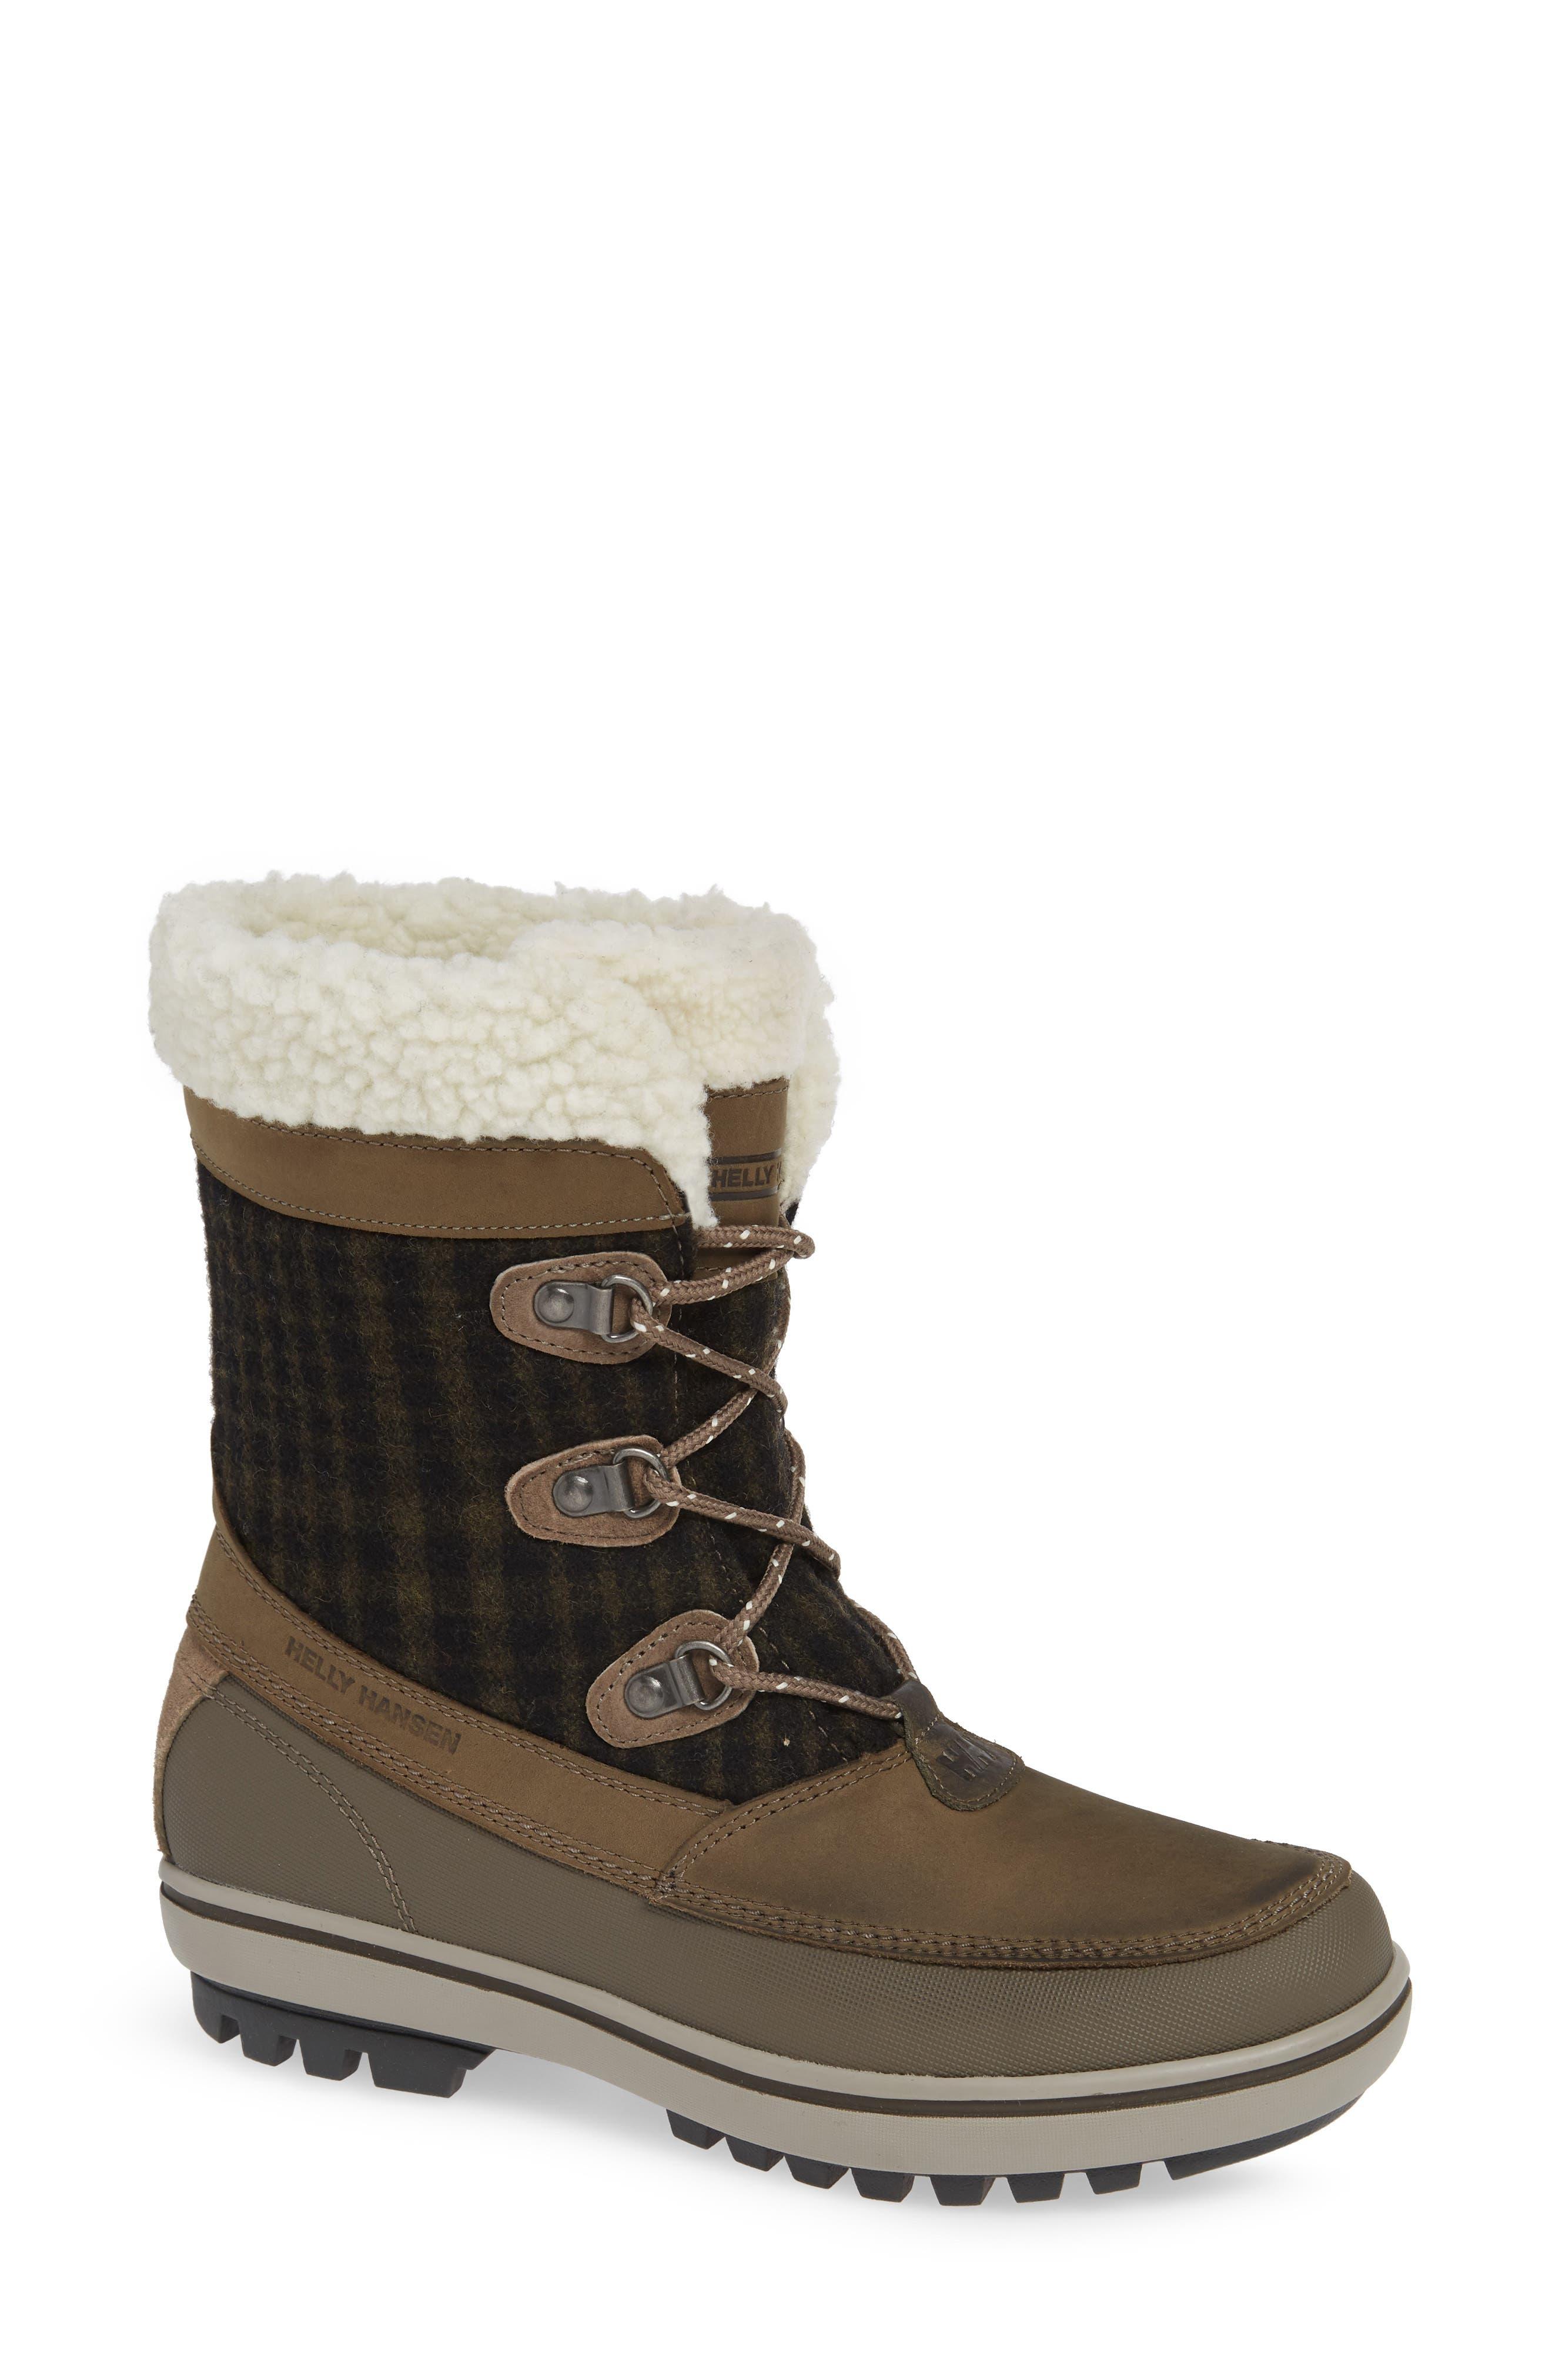 Helly Hansen Georgina Snow Boot, Brown